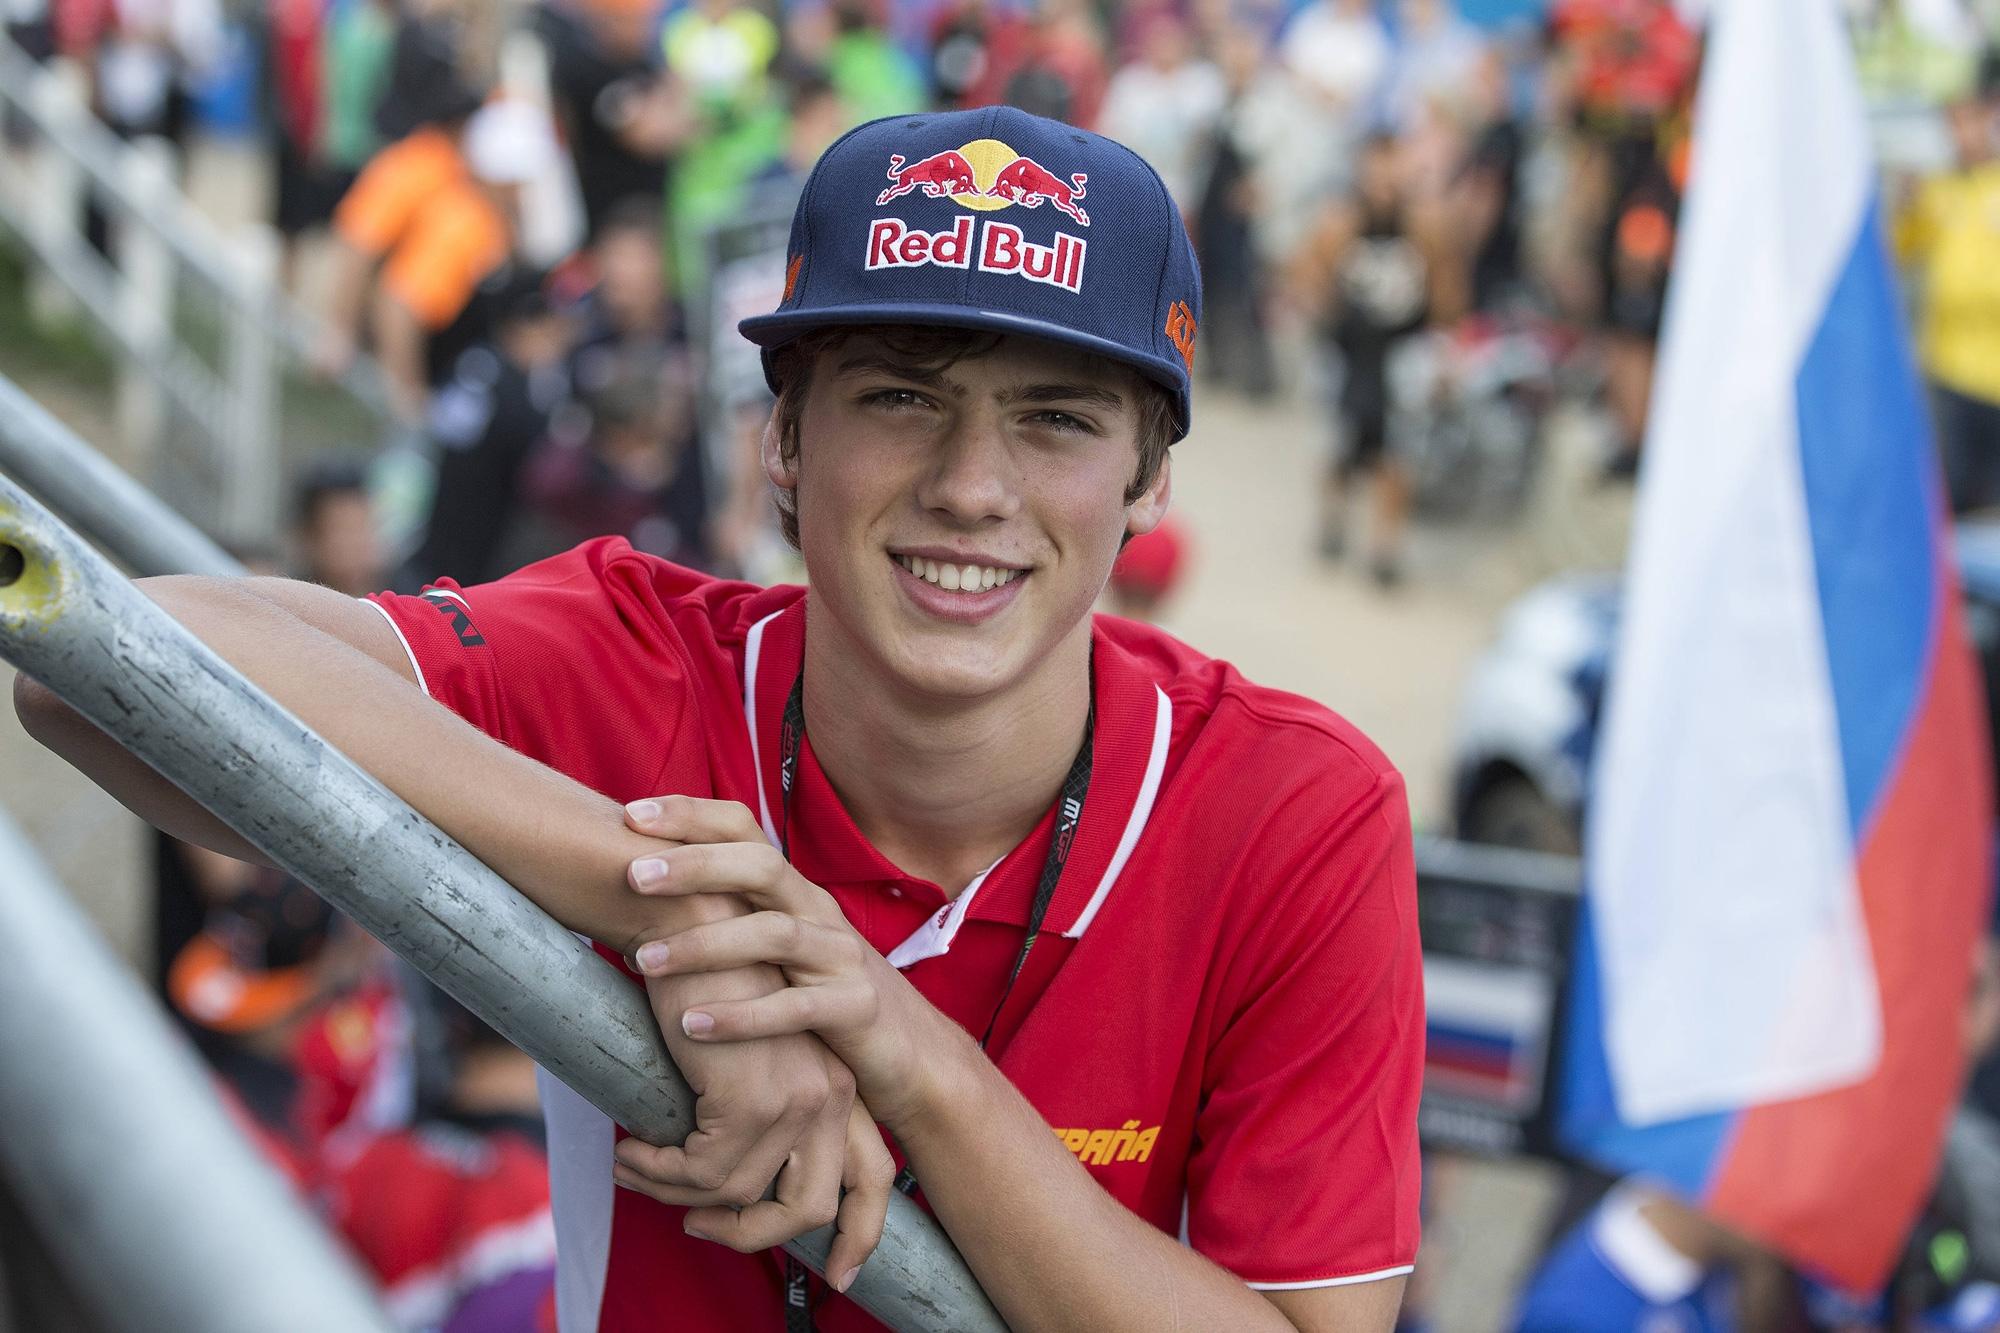 Question de la semaine : Qui est Jorge Prado, futur espoir des GP ?